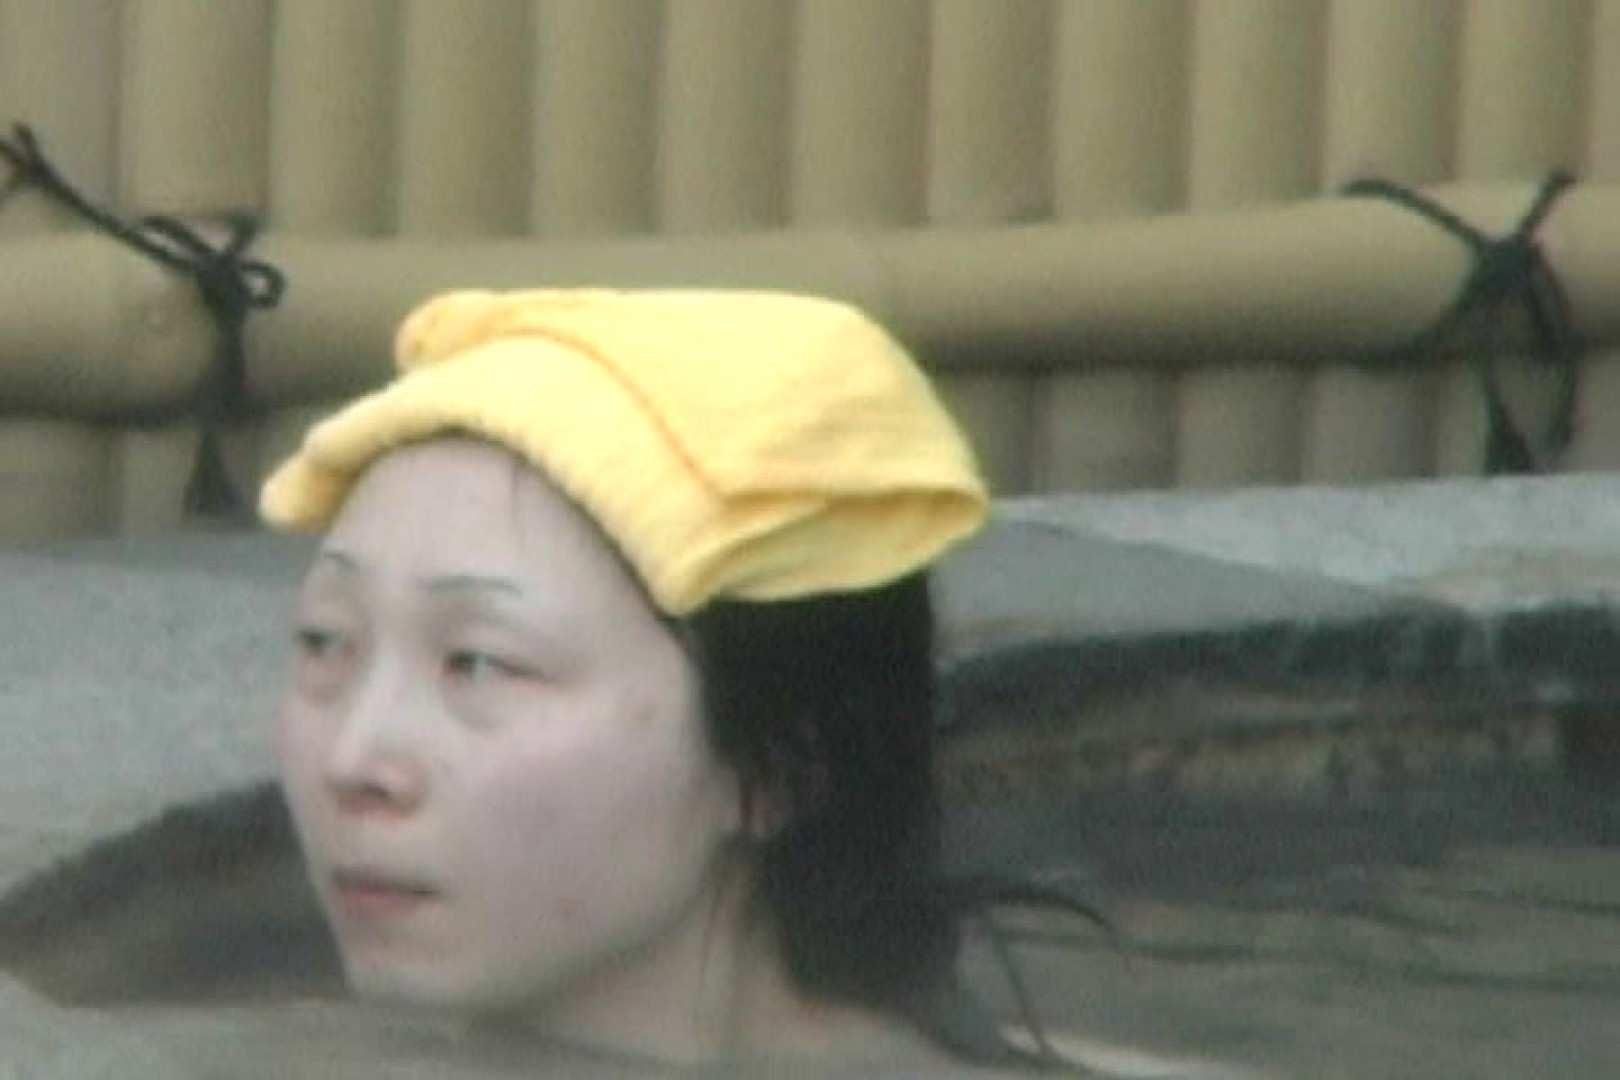 Aquaな露天風呂Vol.596 OLセックス | 盗撮  77画像 34